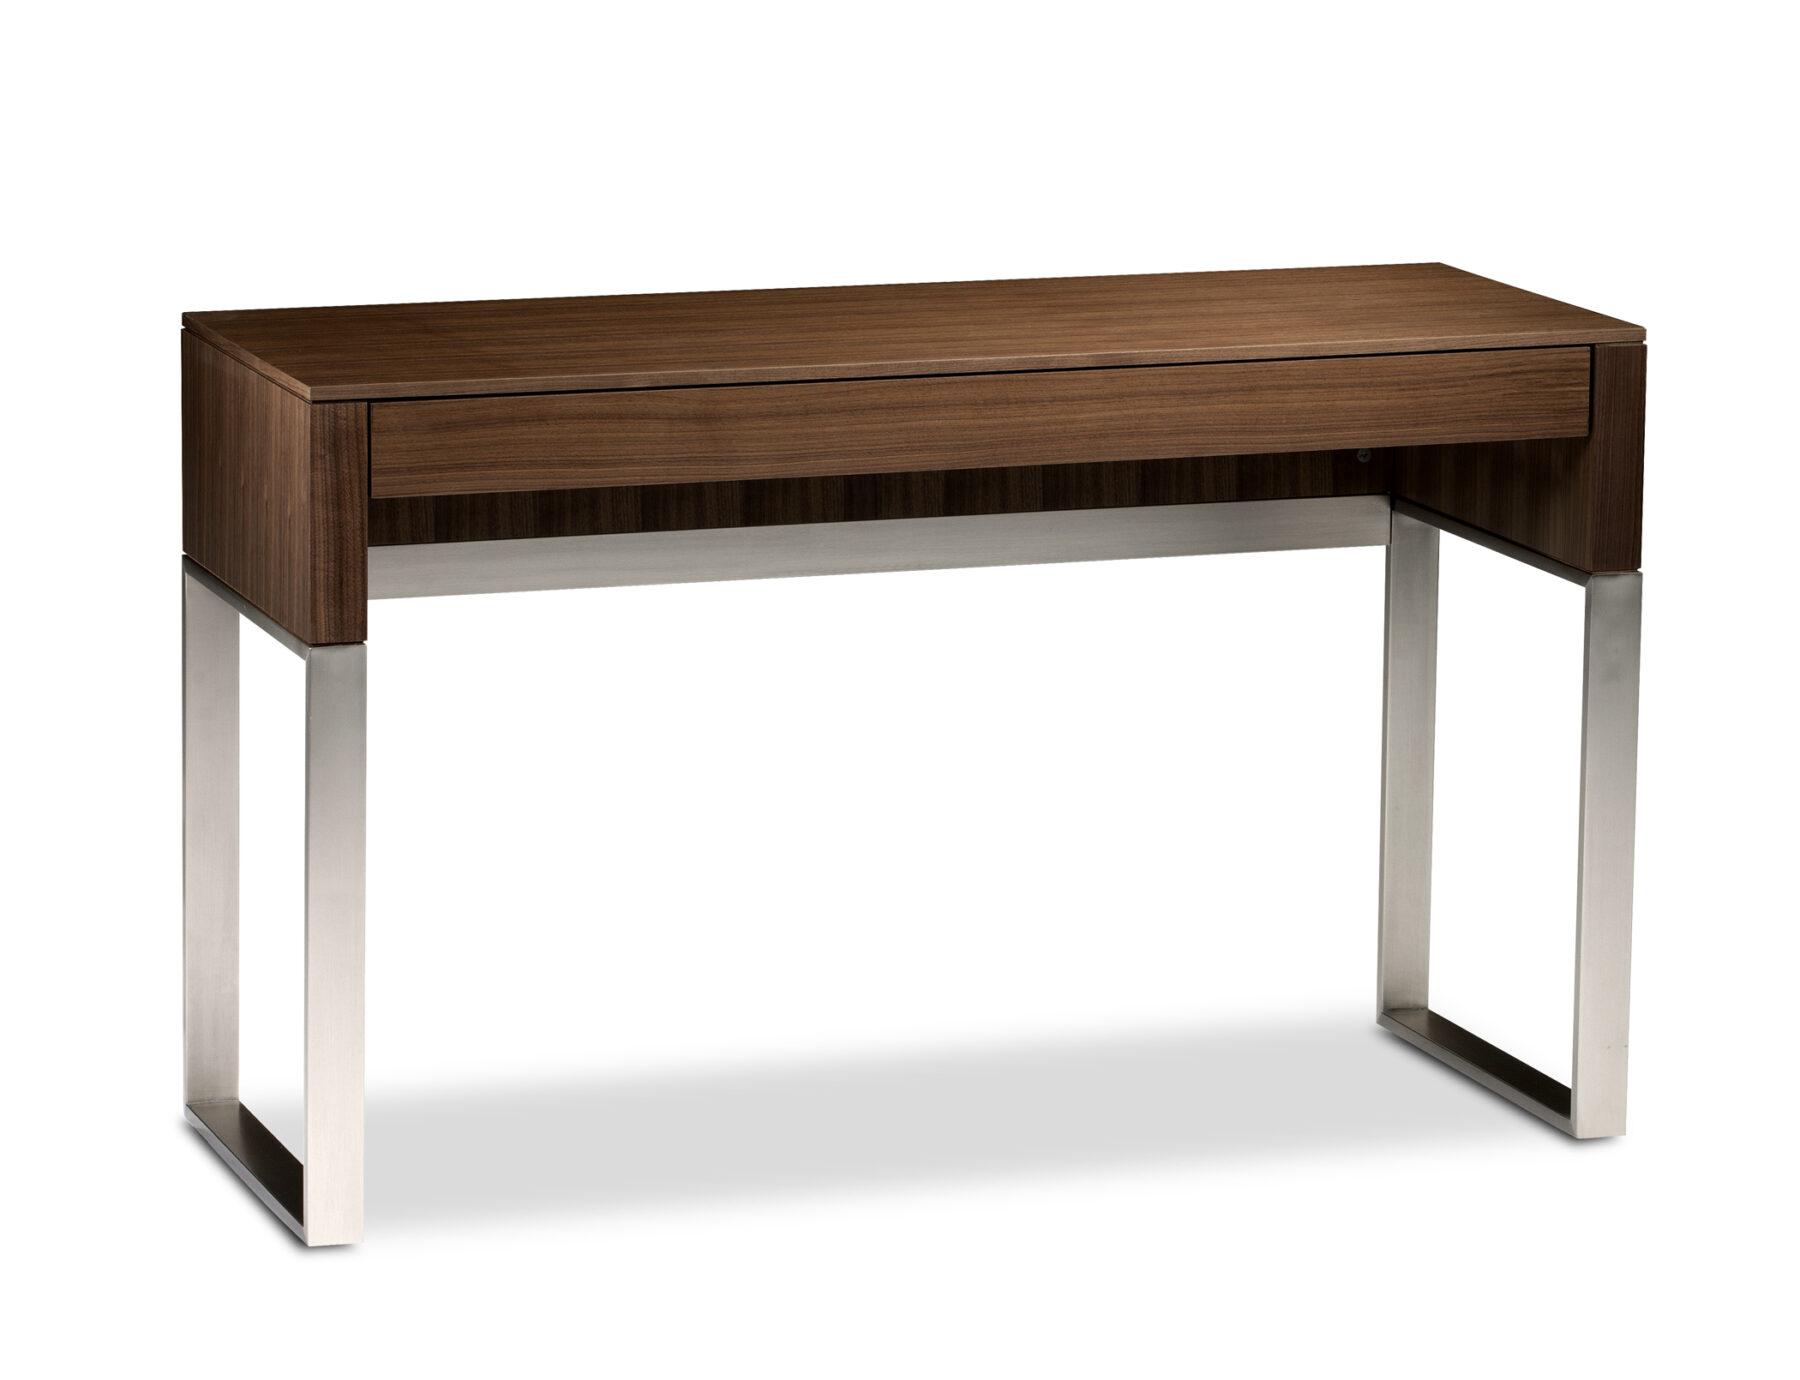 cascadia-6202-walnut-bdi-console-table-1